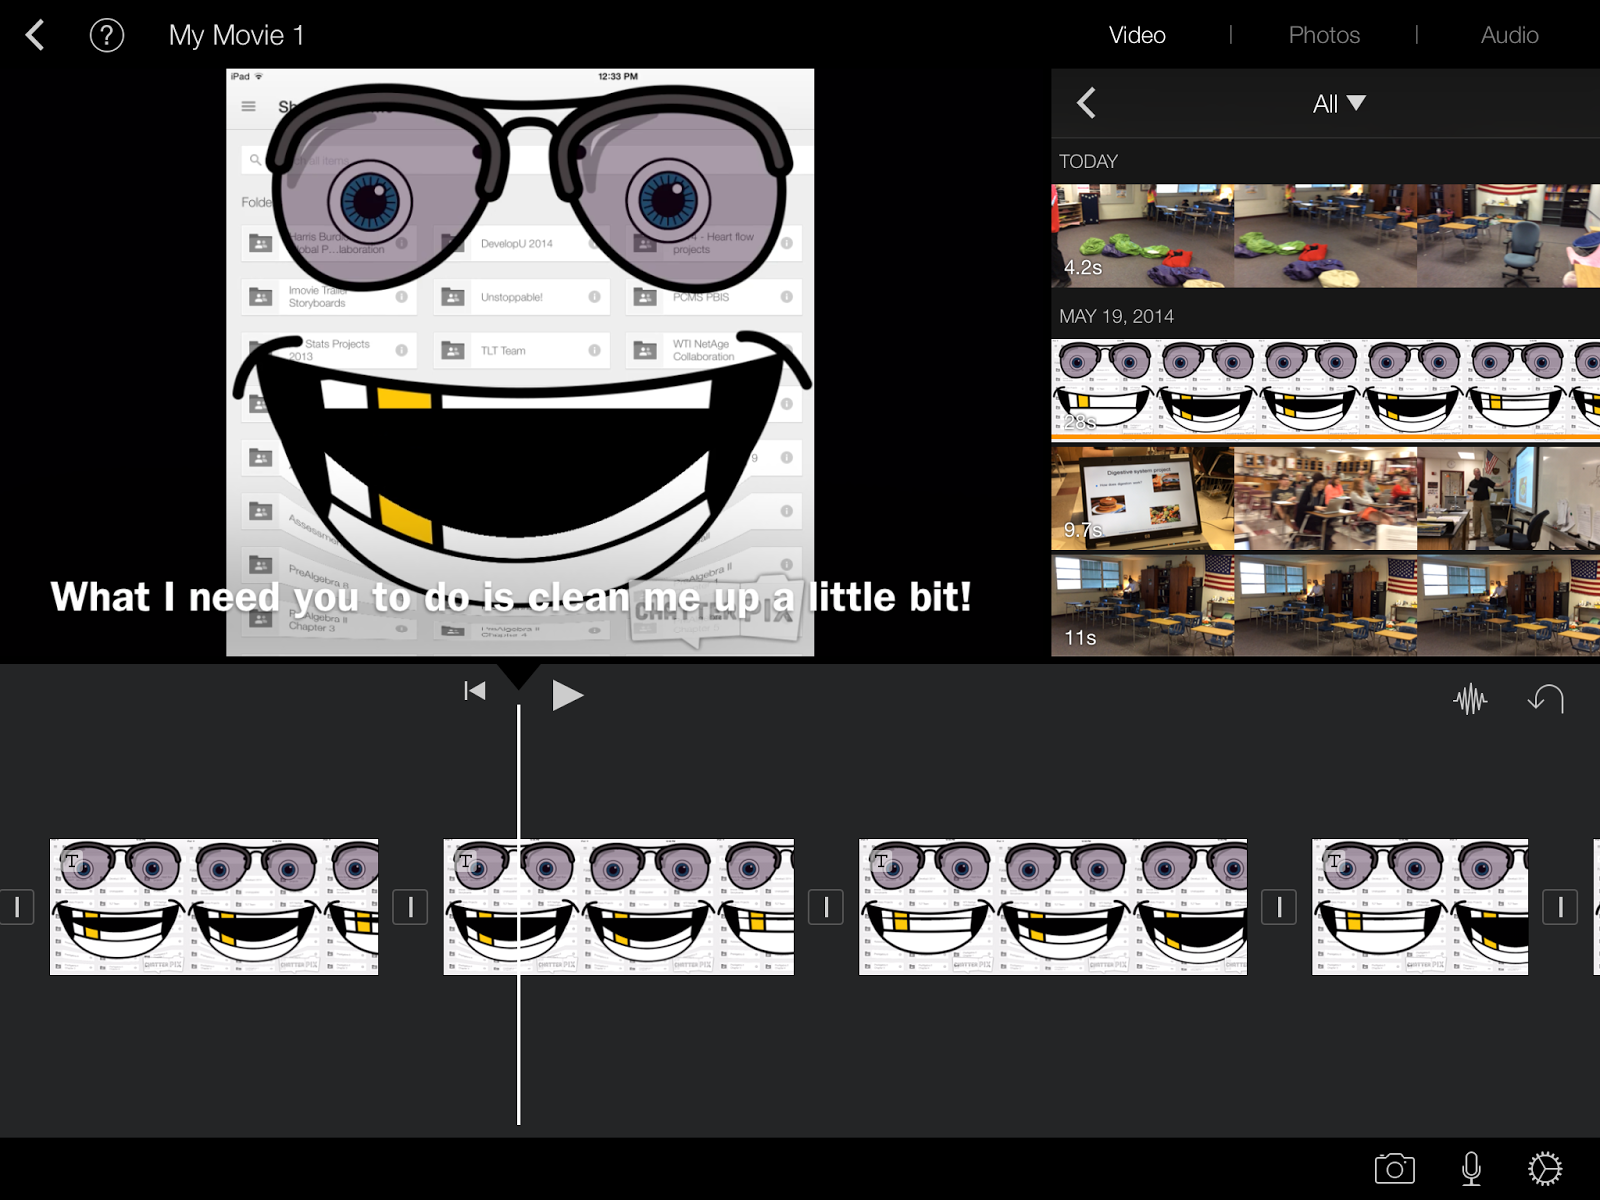 iPaddiction: iMovie On iPad - Adding Subtitles - splicing clips to ...